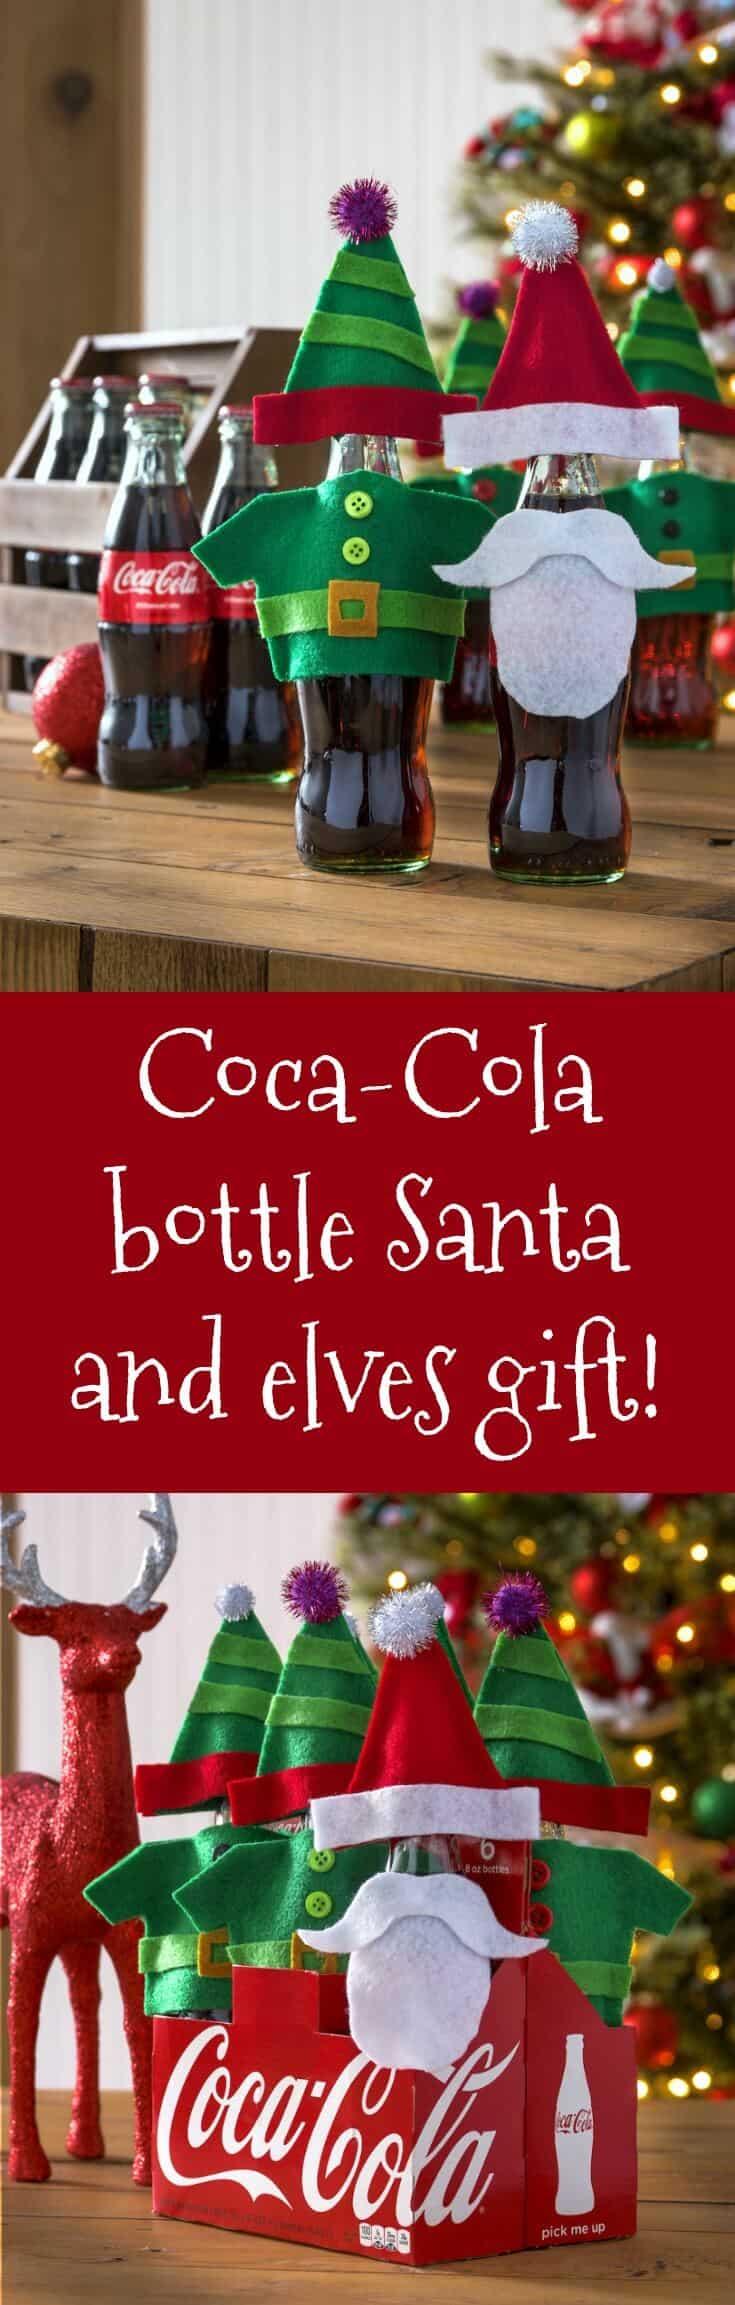 Coca-Cola bottle Santa and elves gift! #ShareACoke - Mod ...